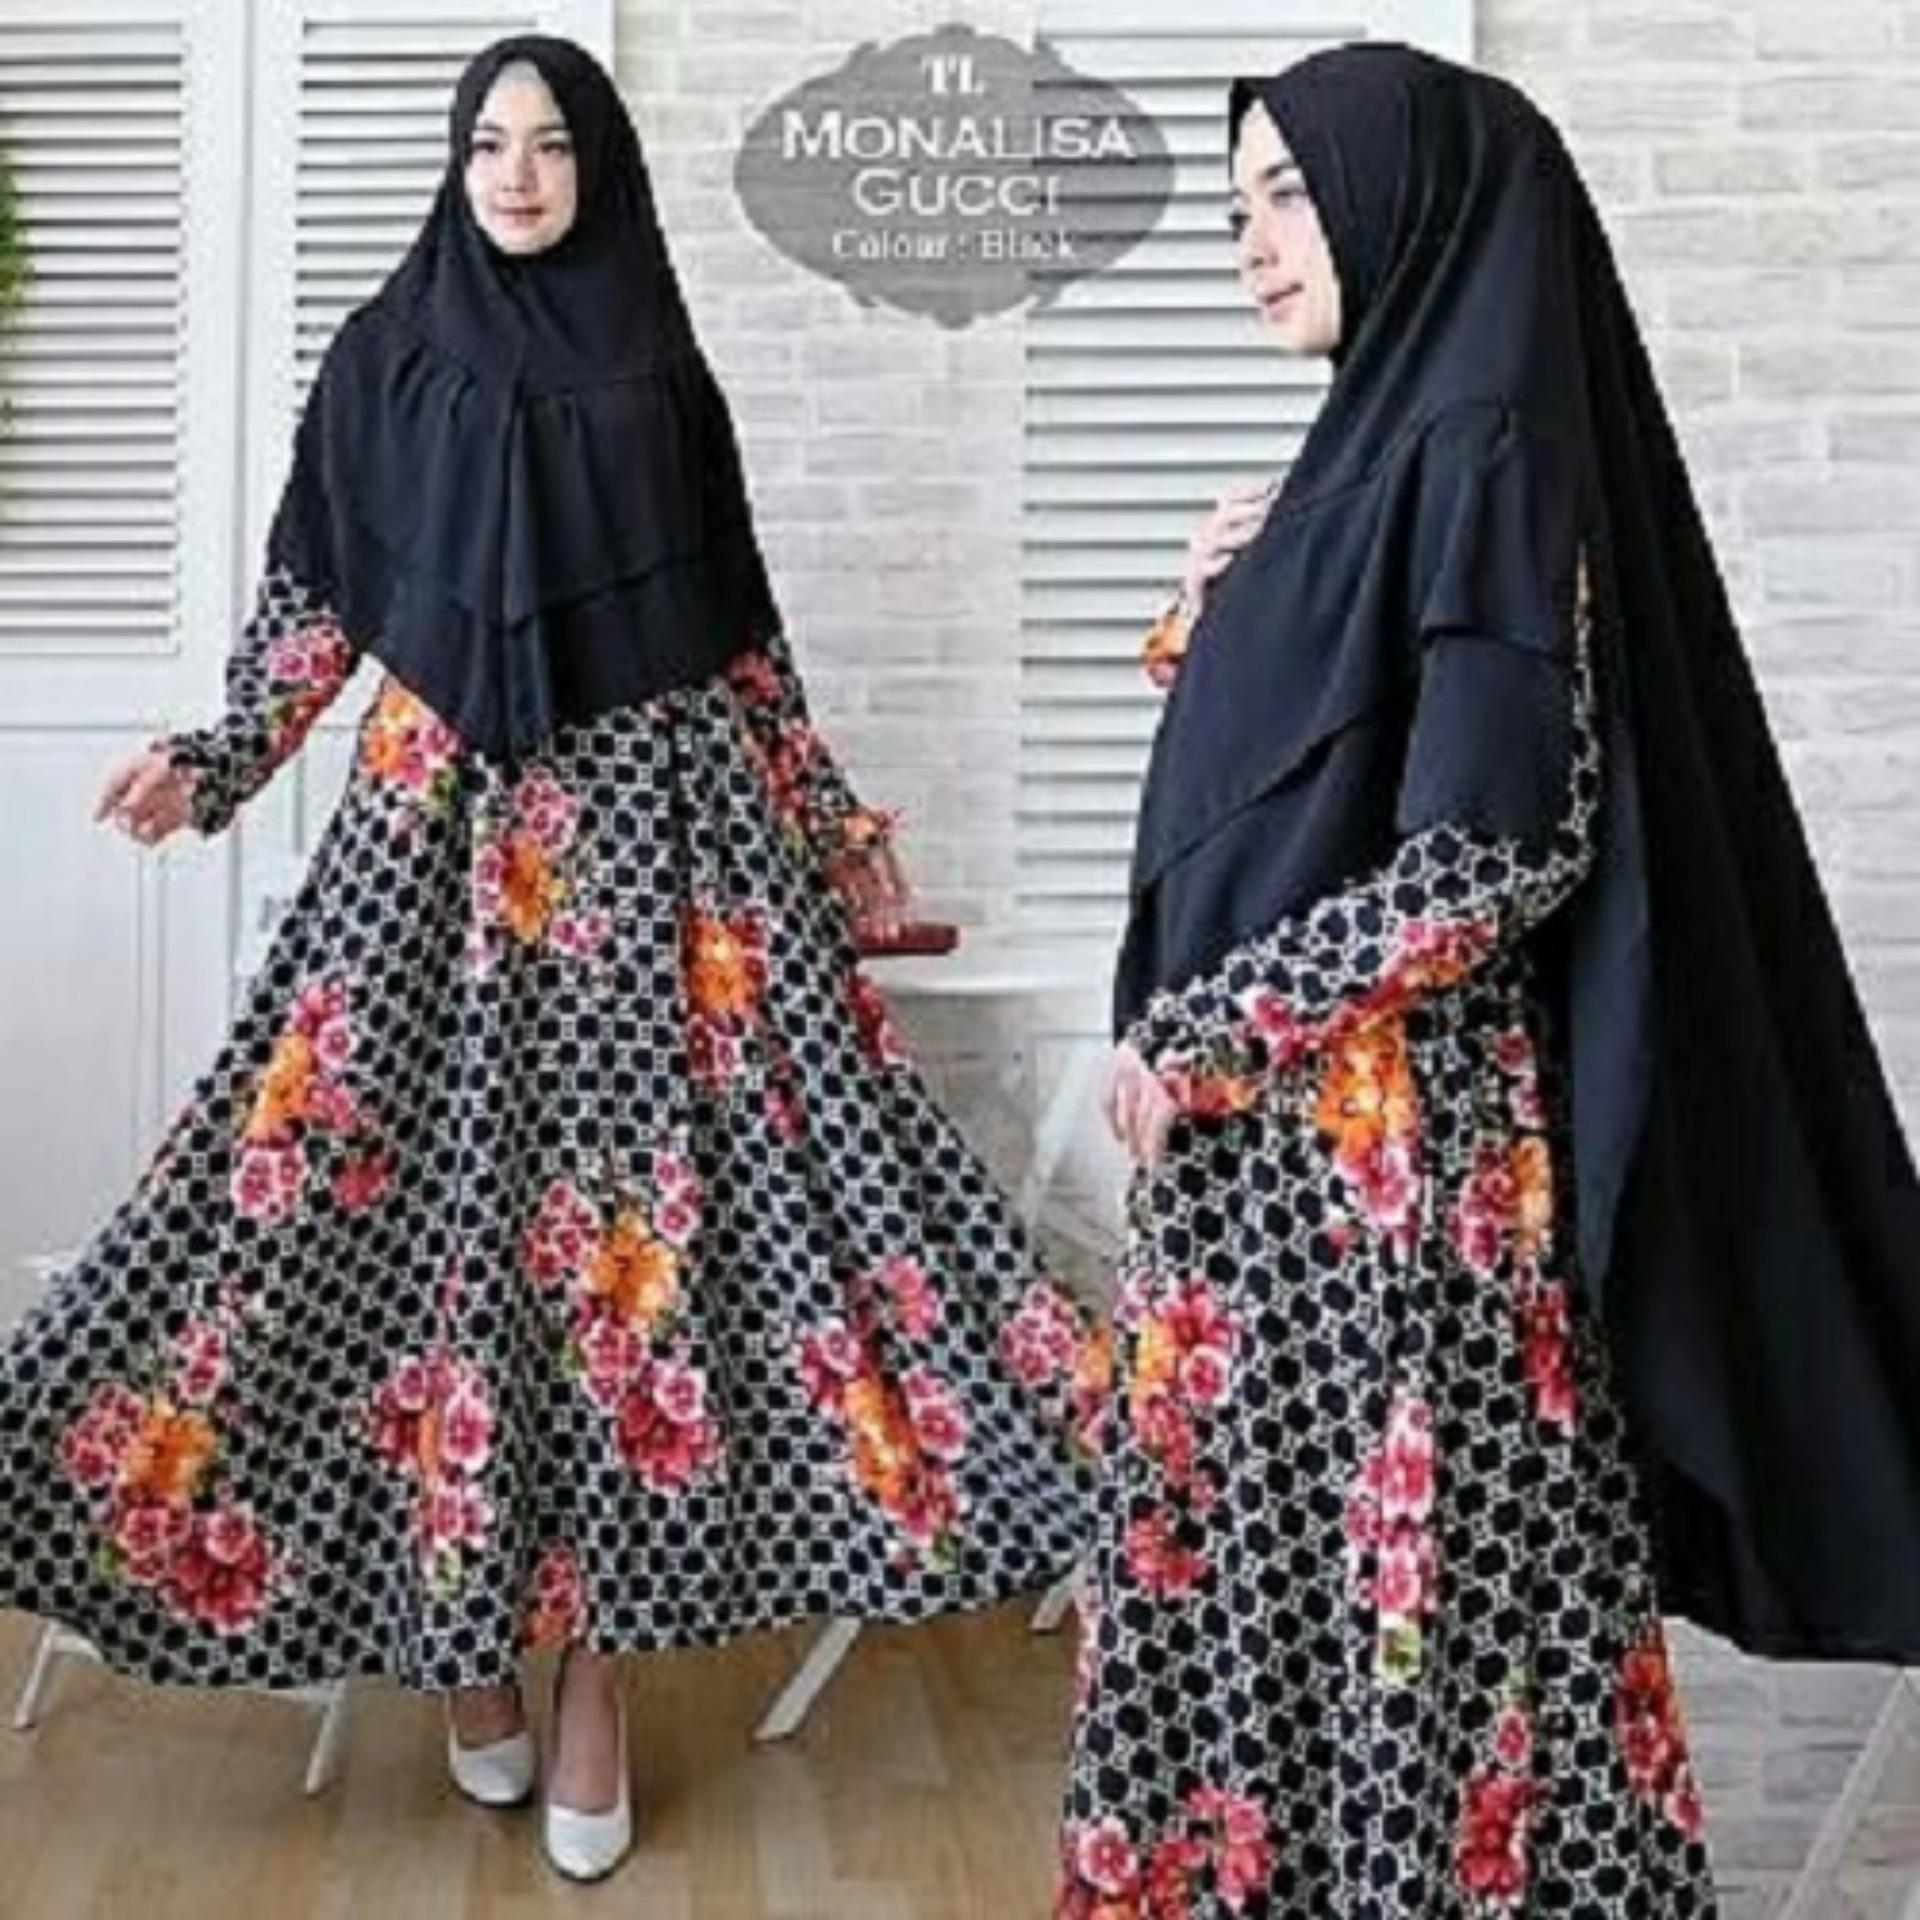 Gamis Wanita Syari - Gamis Muslimah Fashionable - Syari Monalisa Gucci